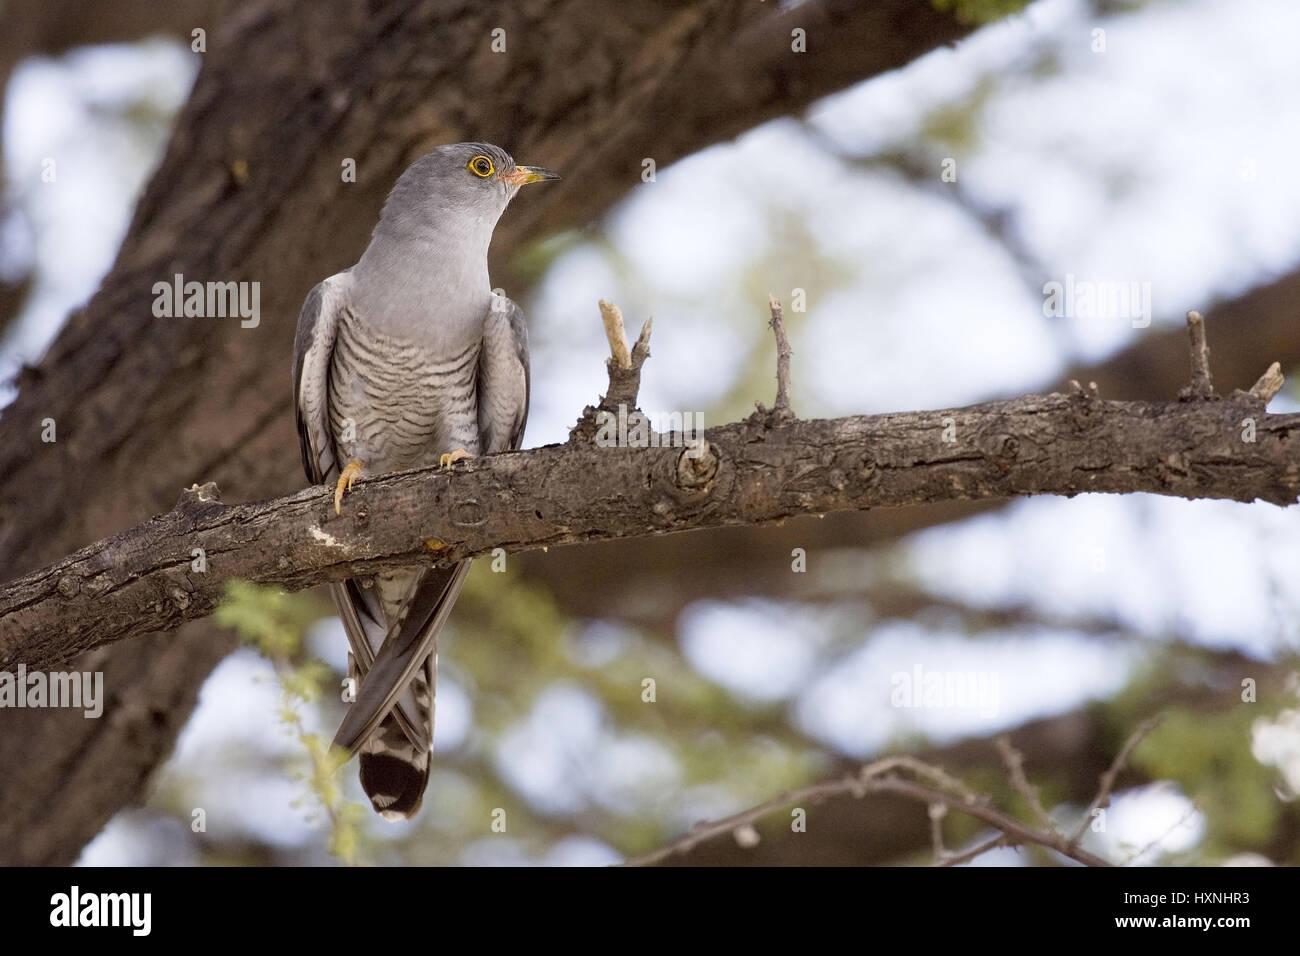 African cuckoo, Cuculus gularis - African Cuckoo, Afrikanischer Kuckuck | Cuculus gularis - African Cuckoo  auf - Stock Image